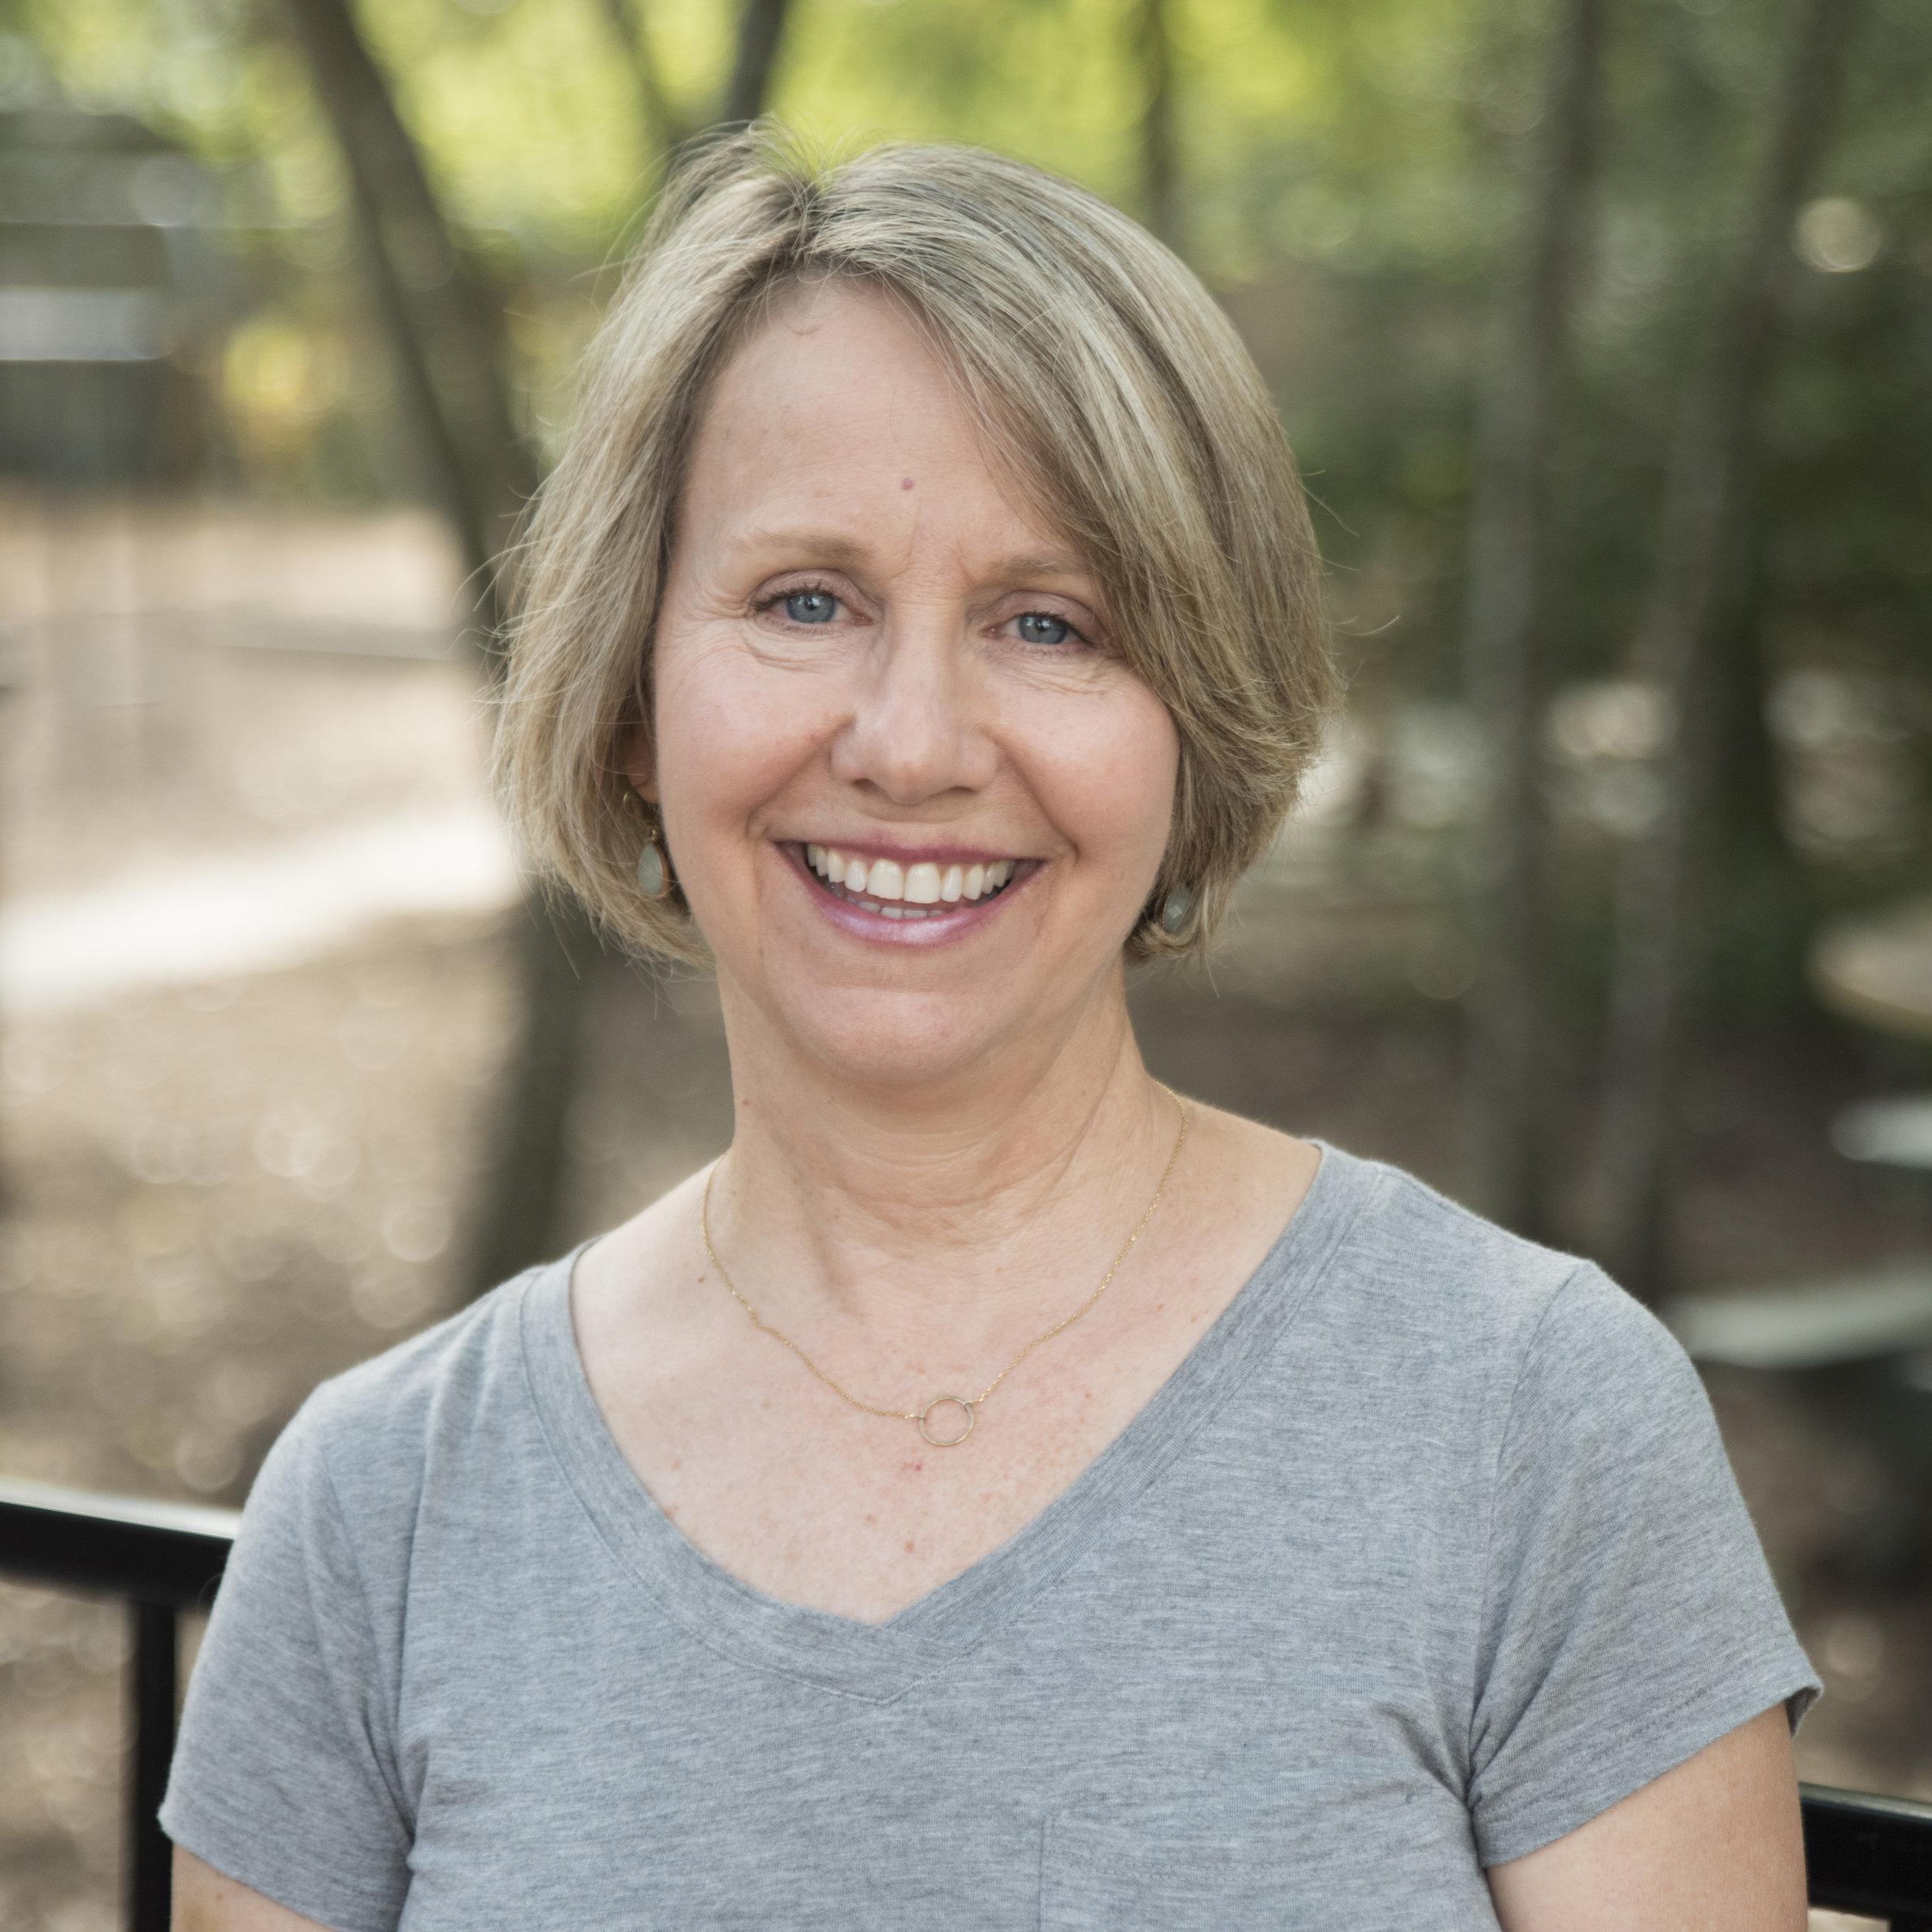 Mary Altendorf - teaches Kindergarten